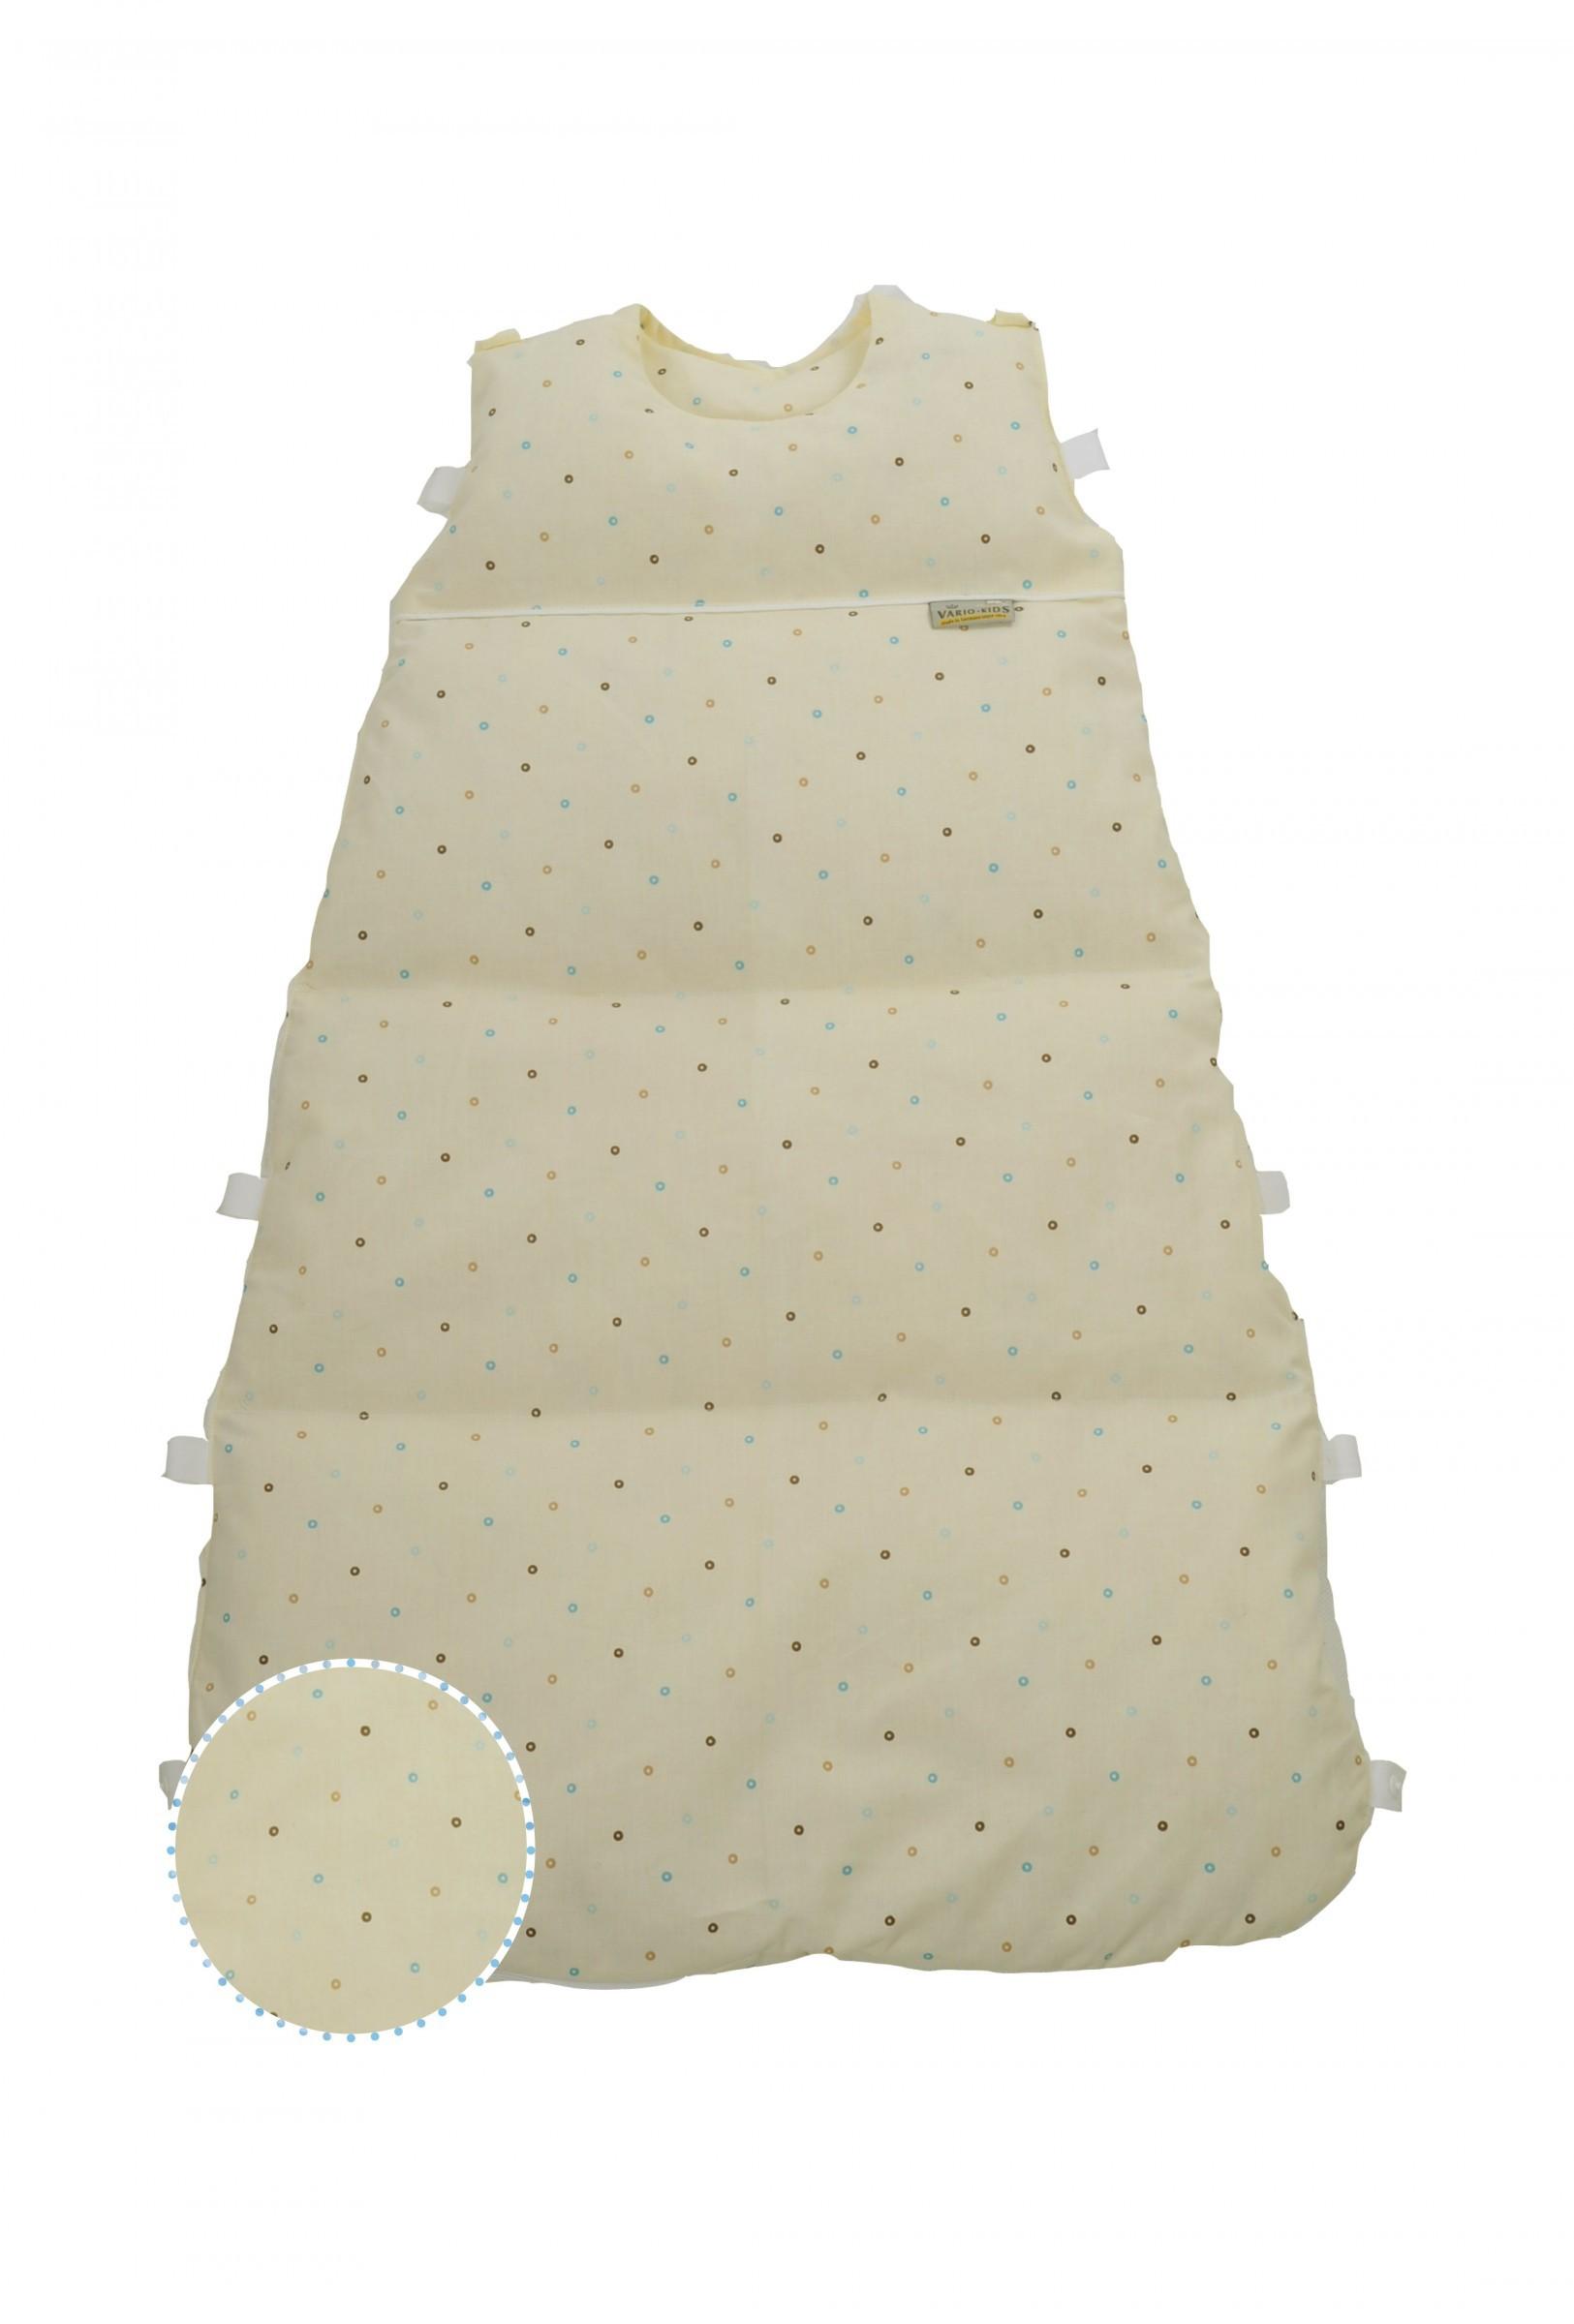 artl nder hiver sac de couchage nid d 39 ange cosy san. Black Bedroom Furniture Sets. Home Design Ideas